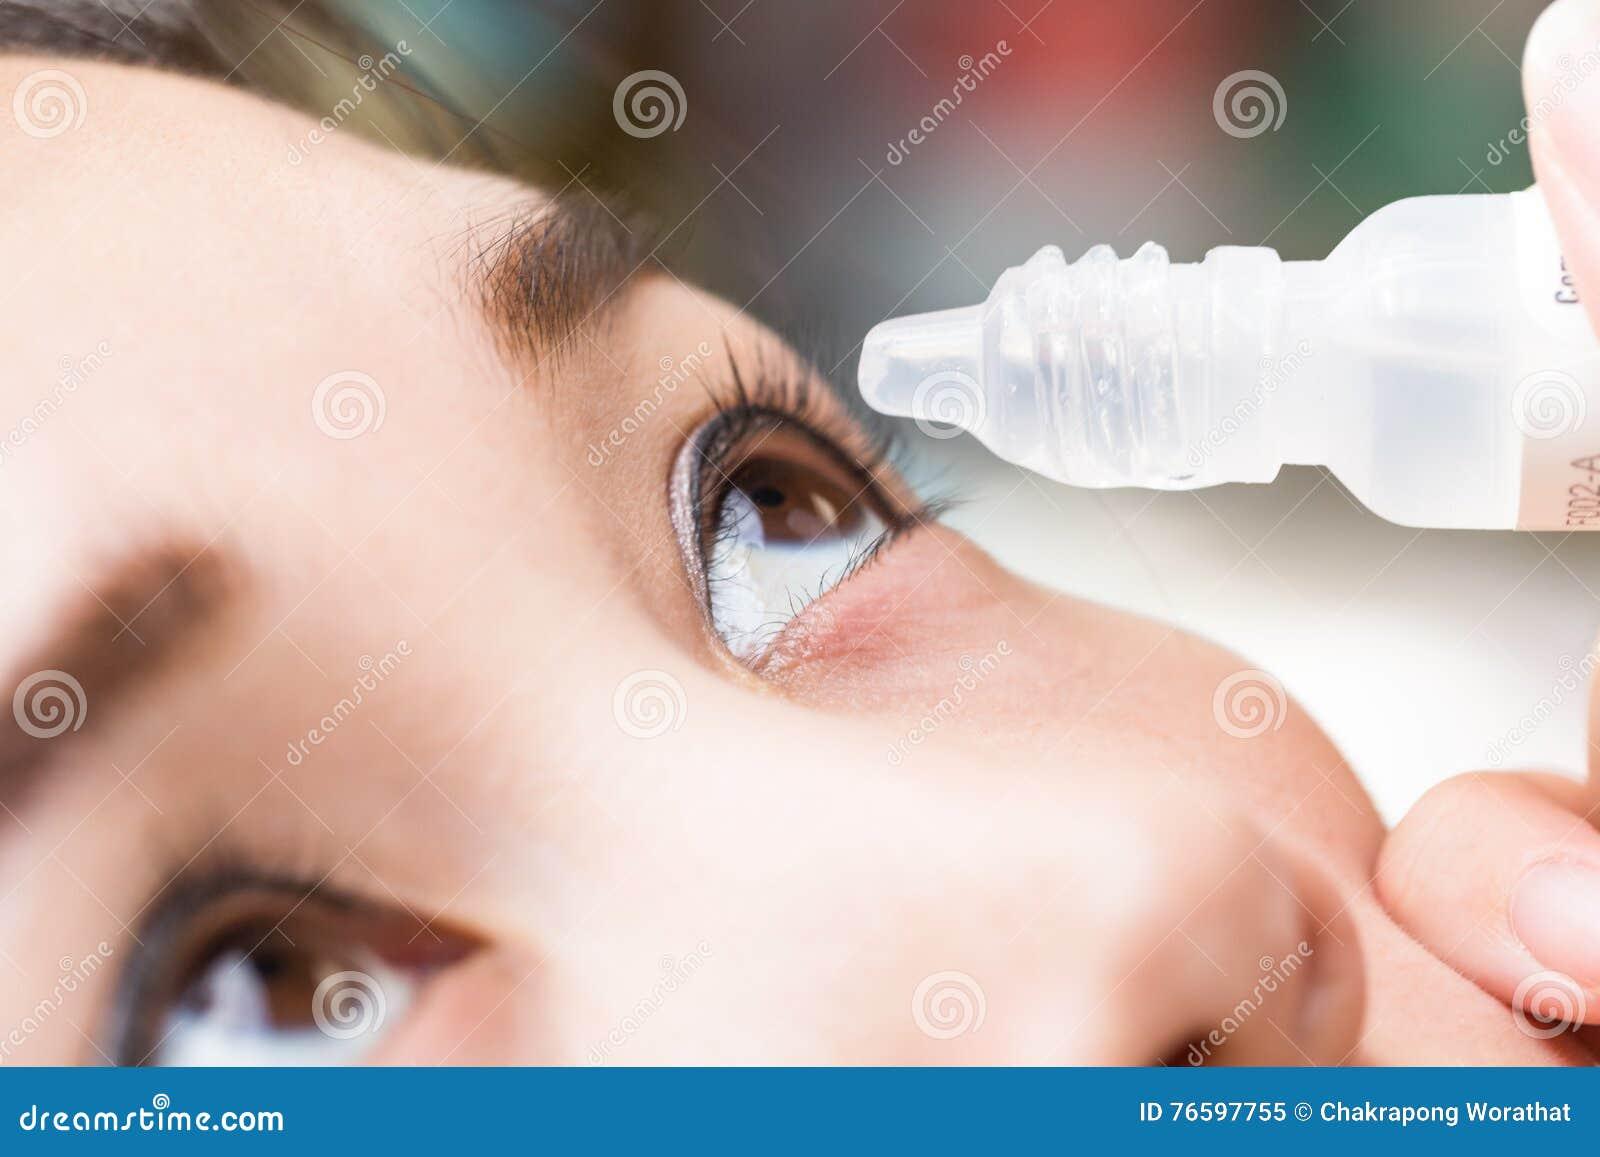 Close up drips into eye cataract medication.